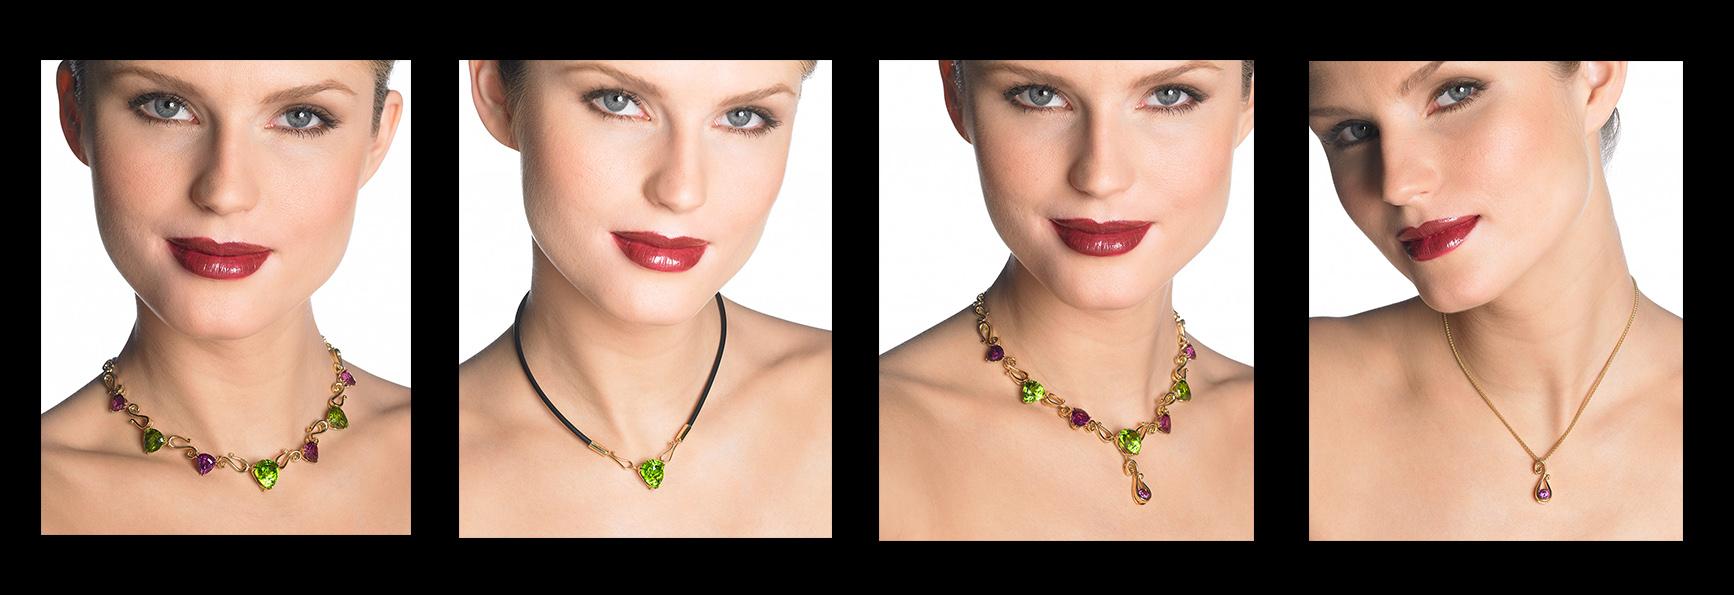 Cynthia Renée's custom Orchid Necklace: Peridot, Rhodolite Garnet and yellow gold.